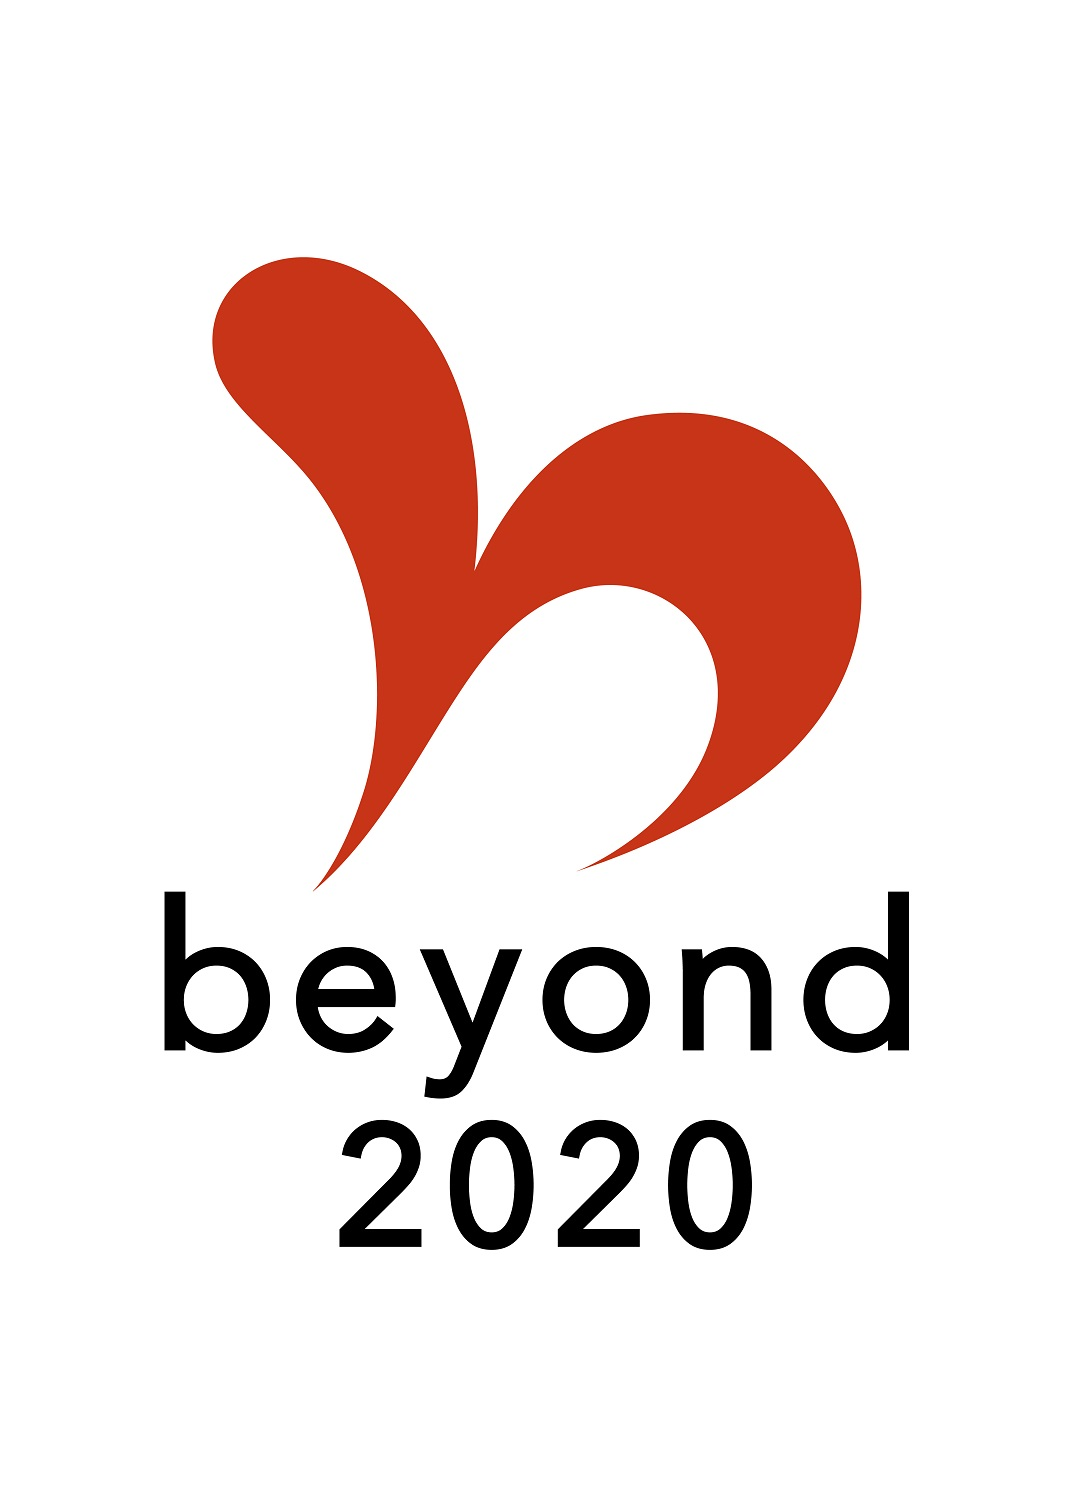 『『『beyond2020ロゴ6』の画像』の画像』の画像